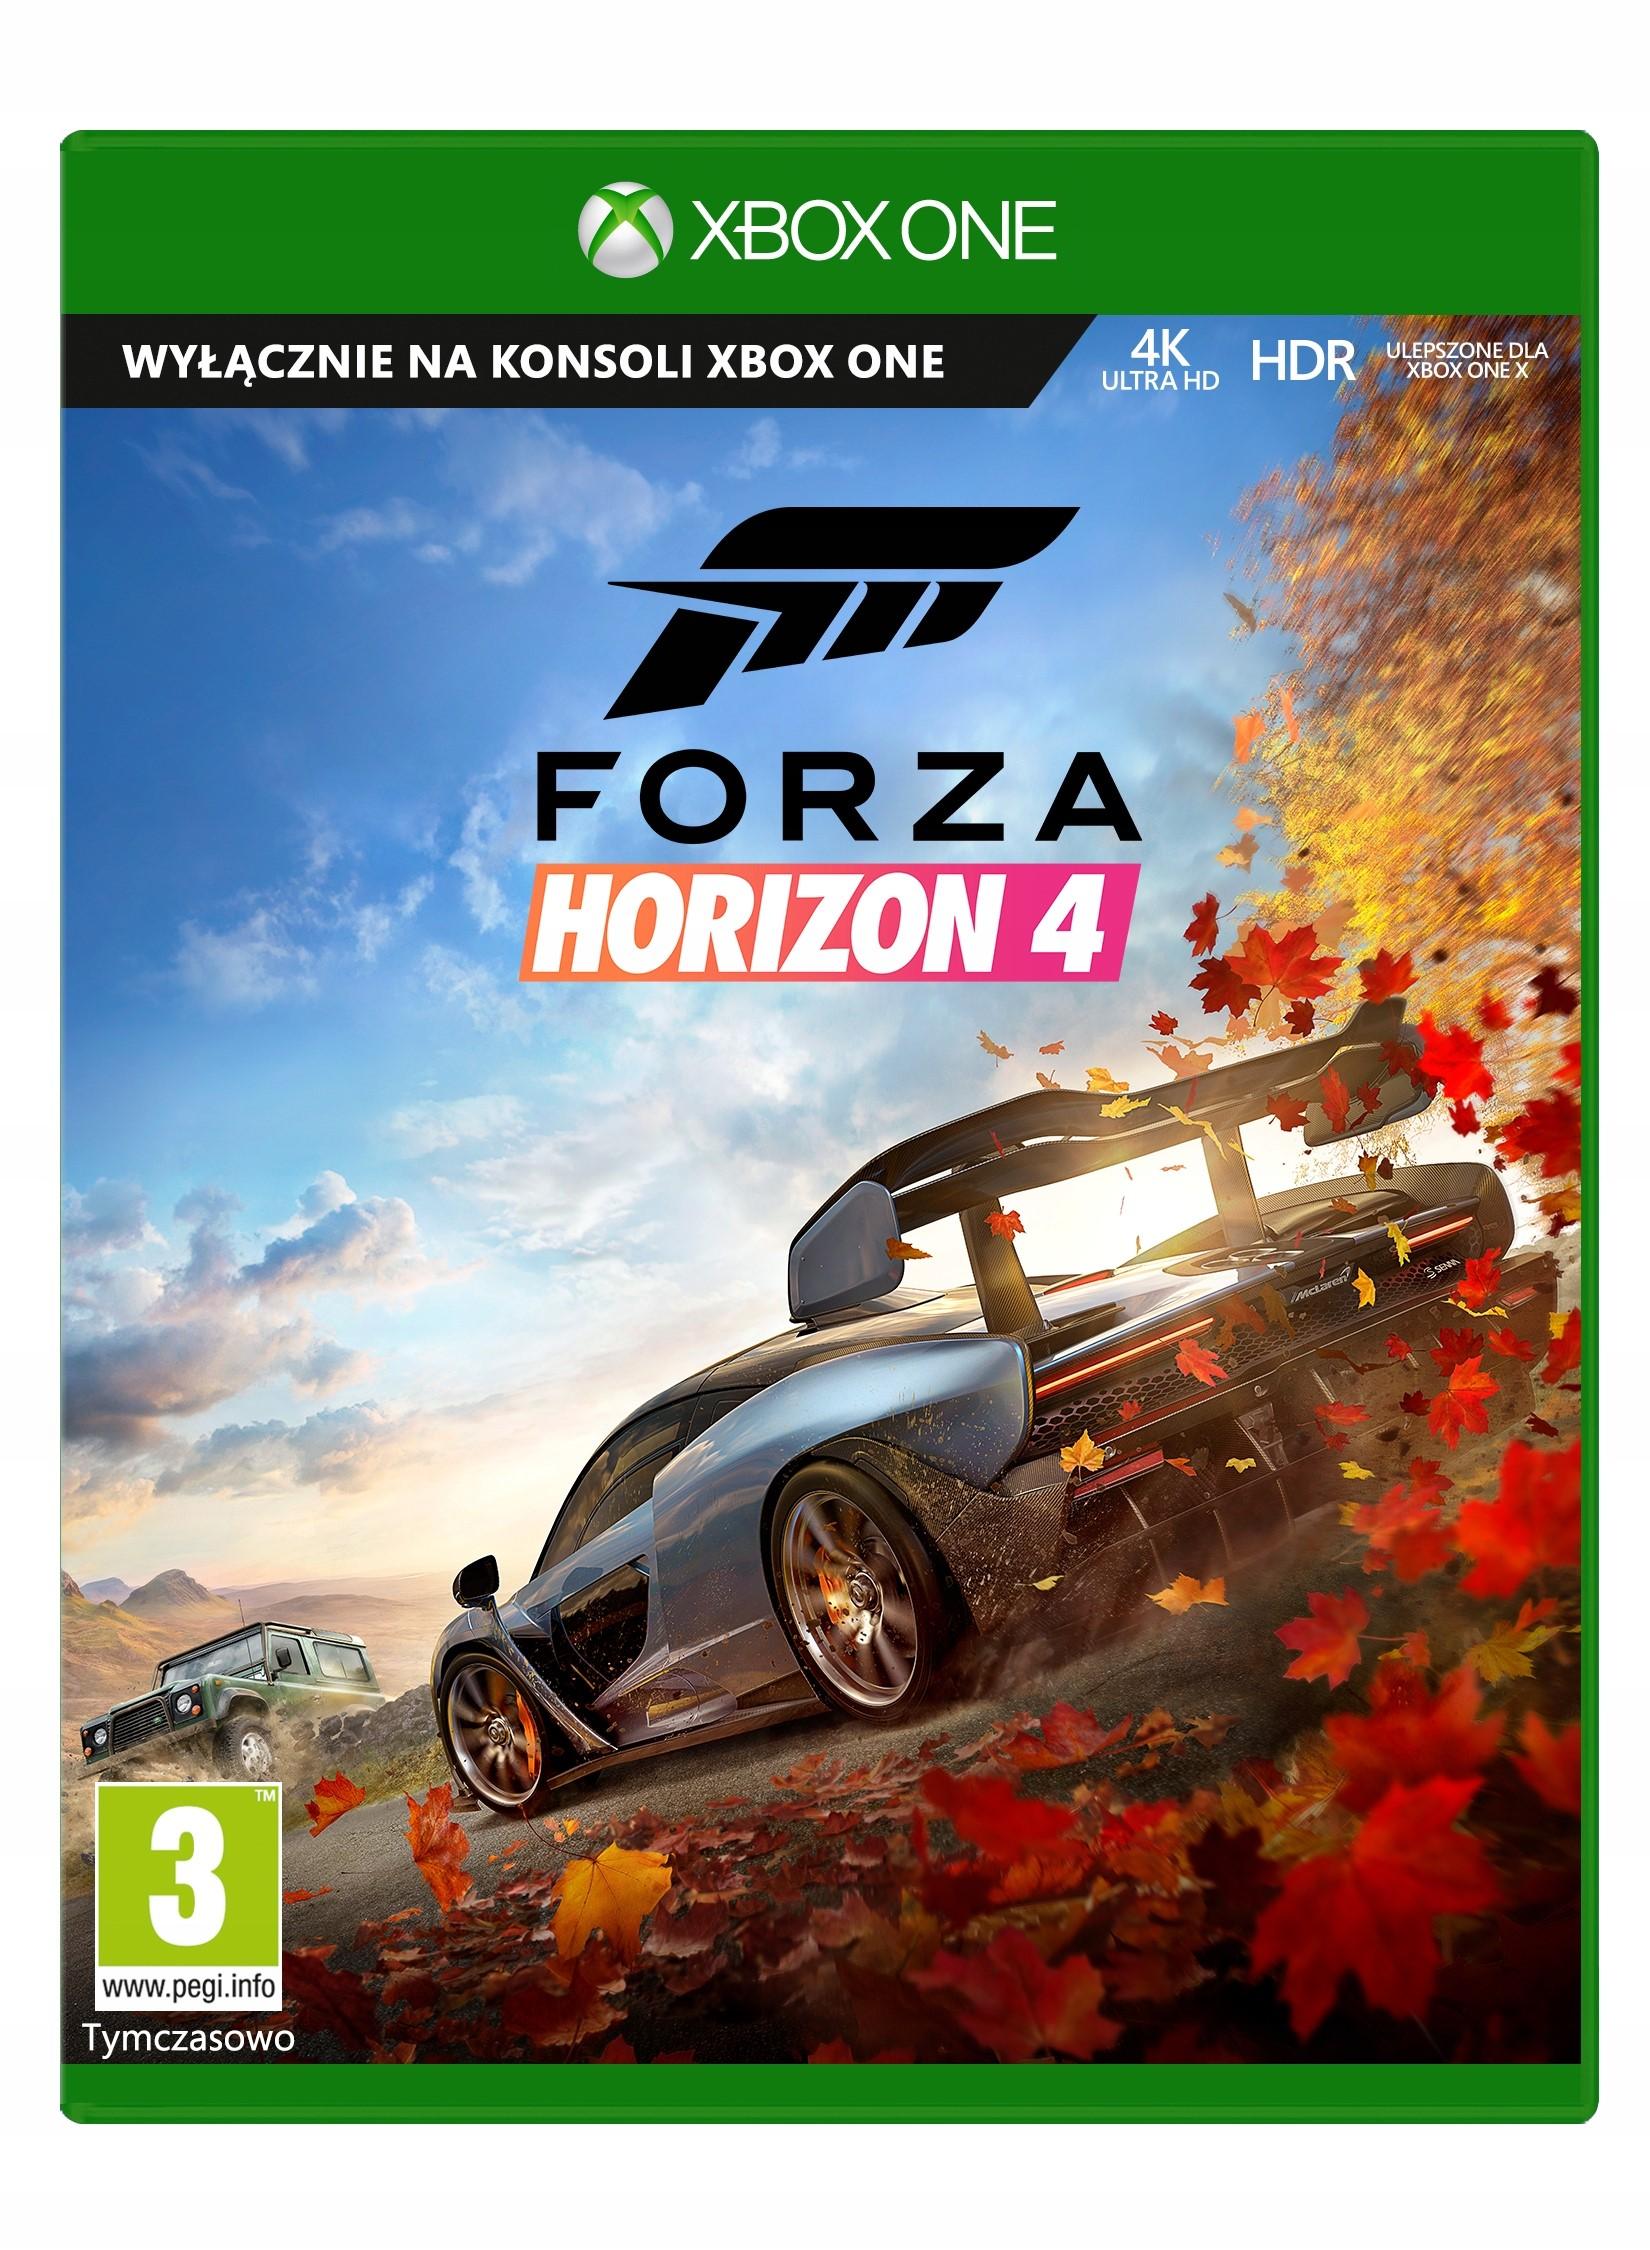 Forza Horizon 4: СТАНДАРТ XBOX ONE / PC Win10 Ключ 🔑